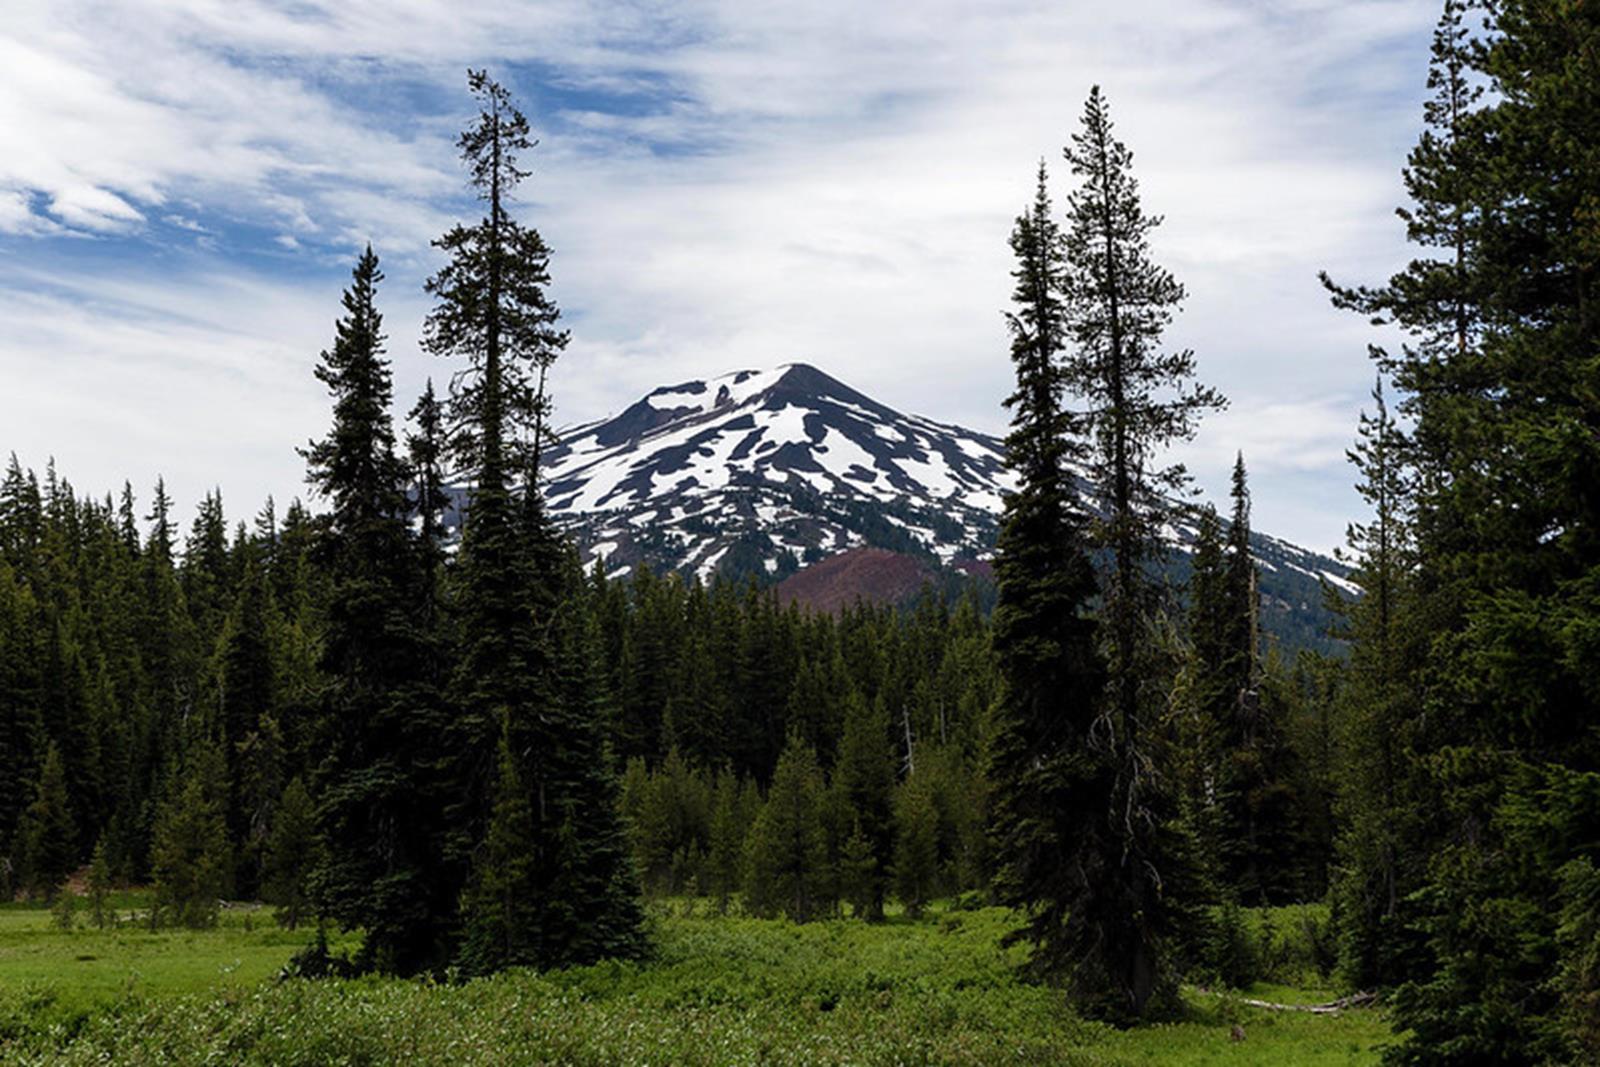 Through trees at Todd Lake, Central Oregon.